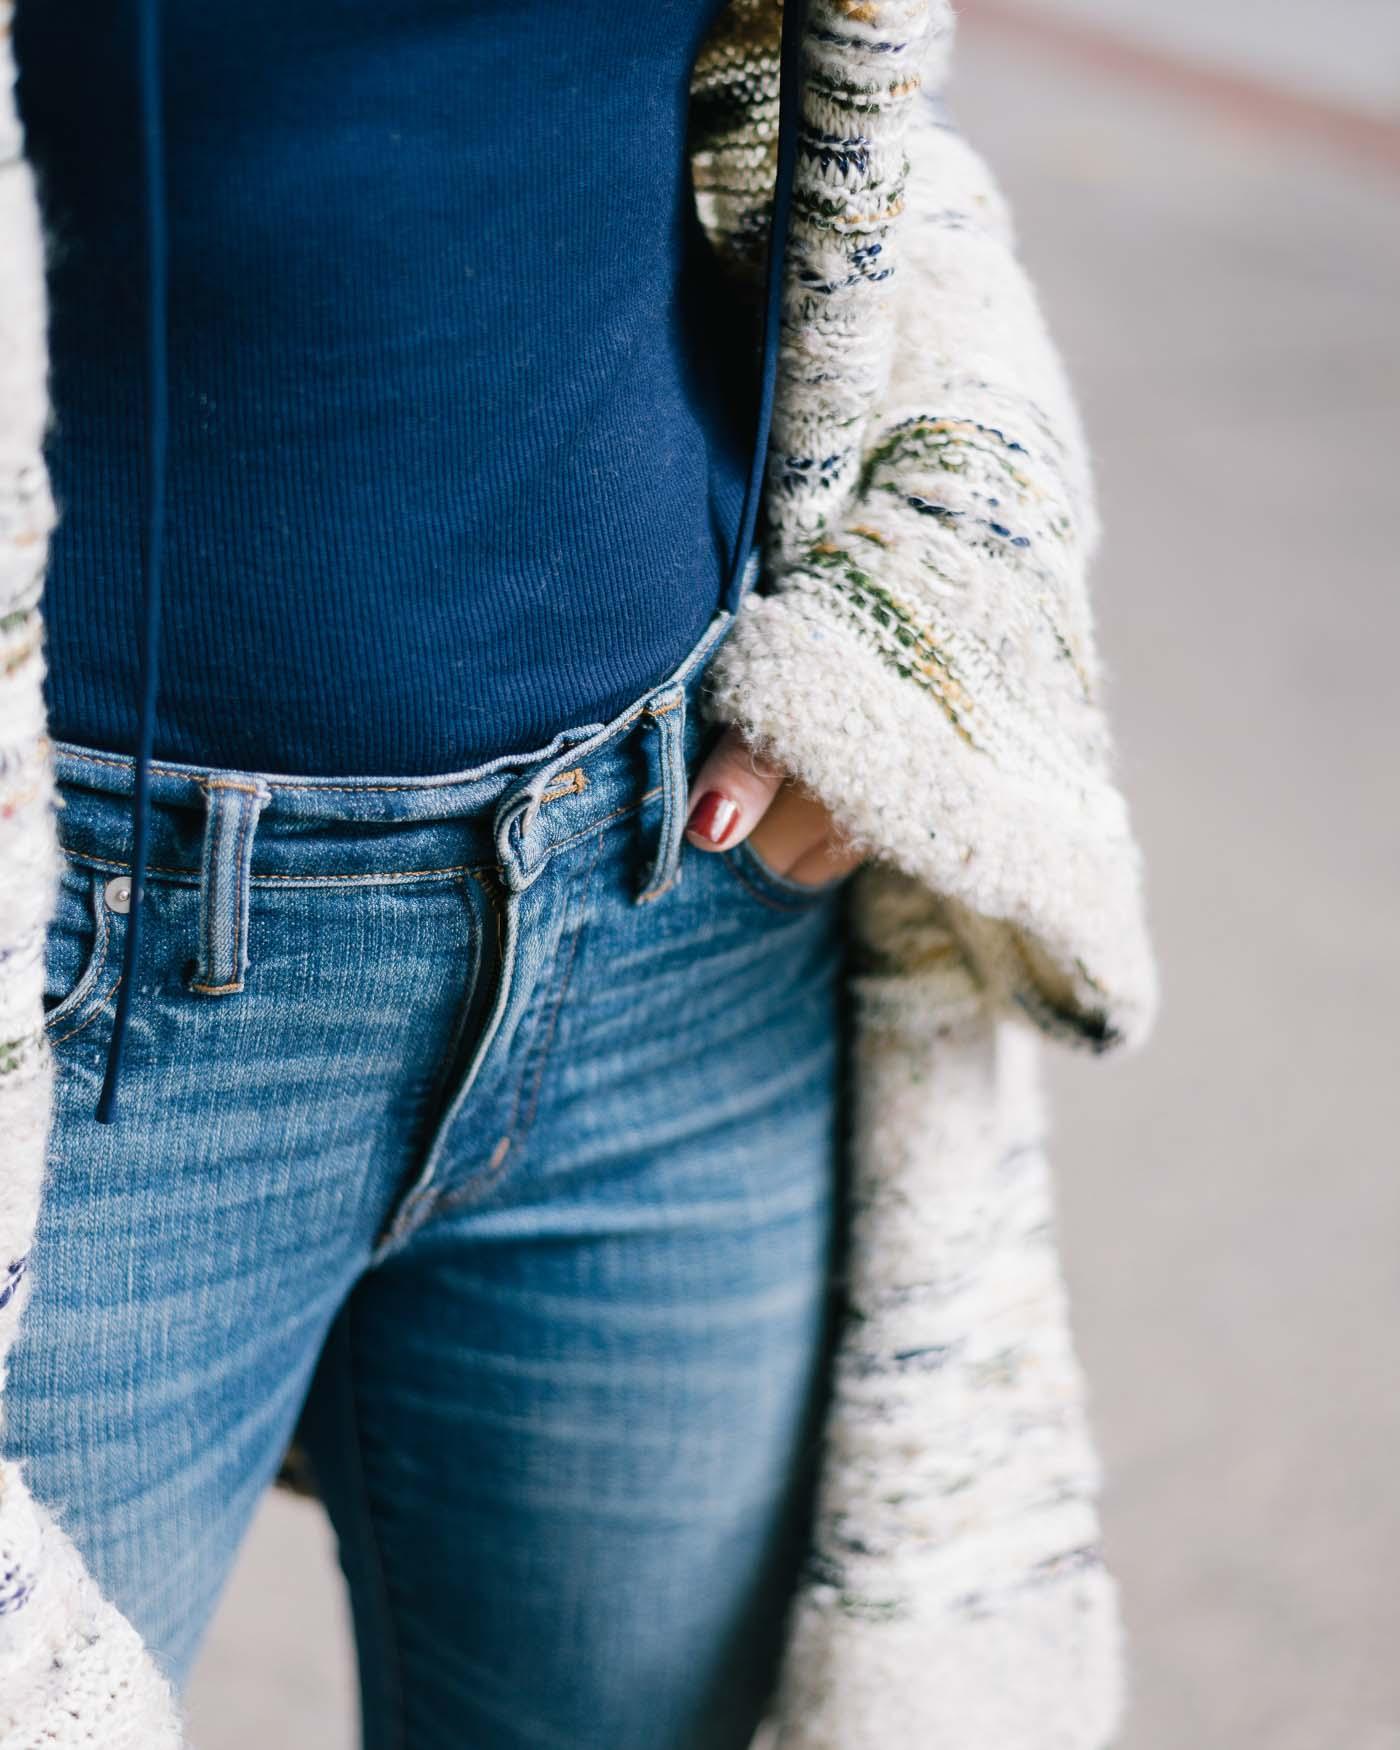 womens fashion, fall outfits, textured details - My Style Vita @mystylevita